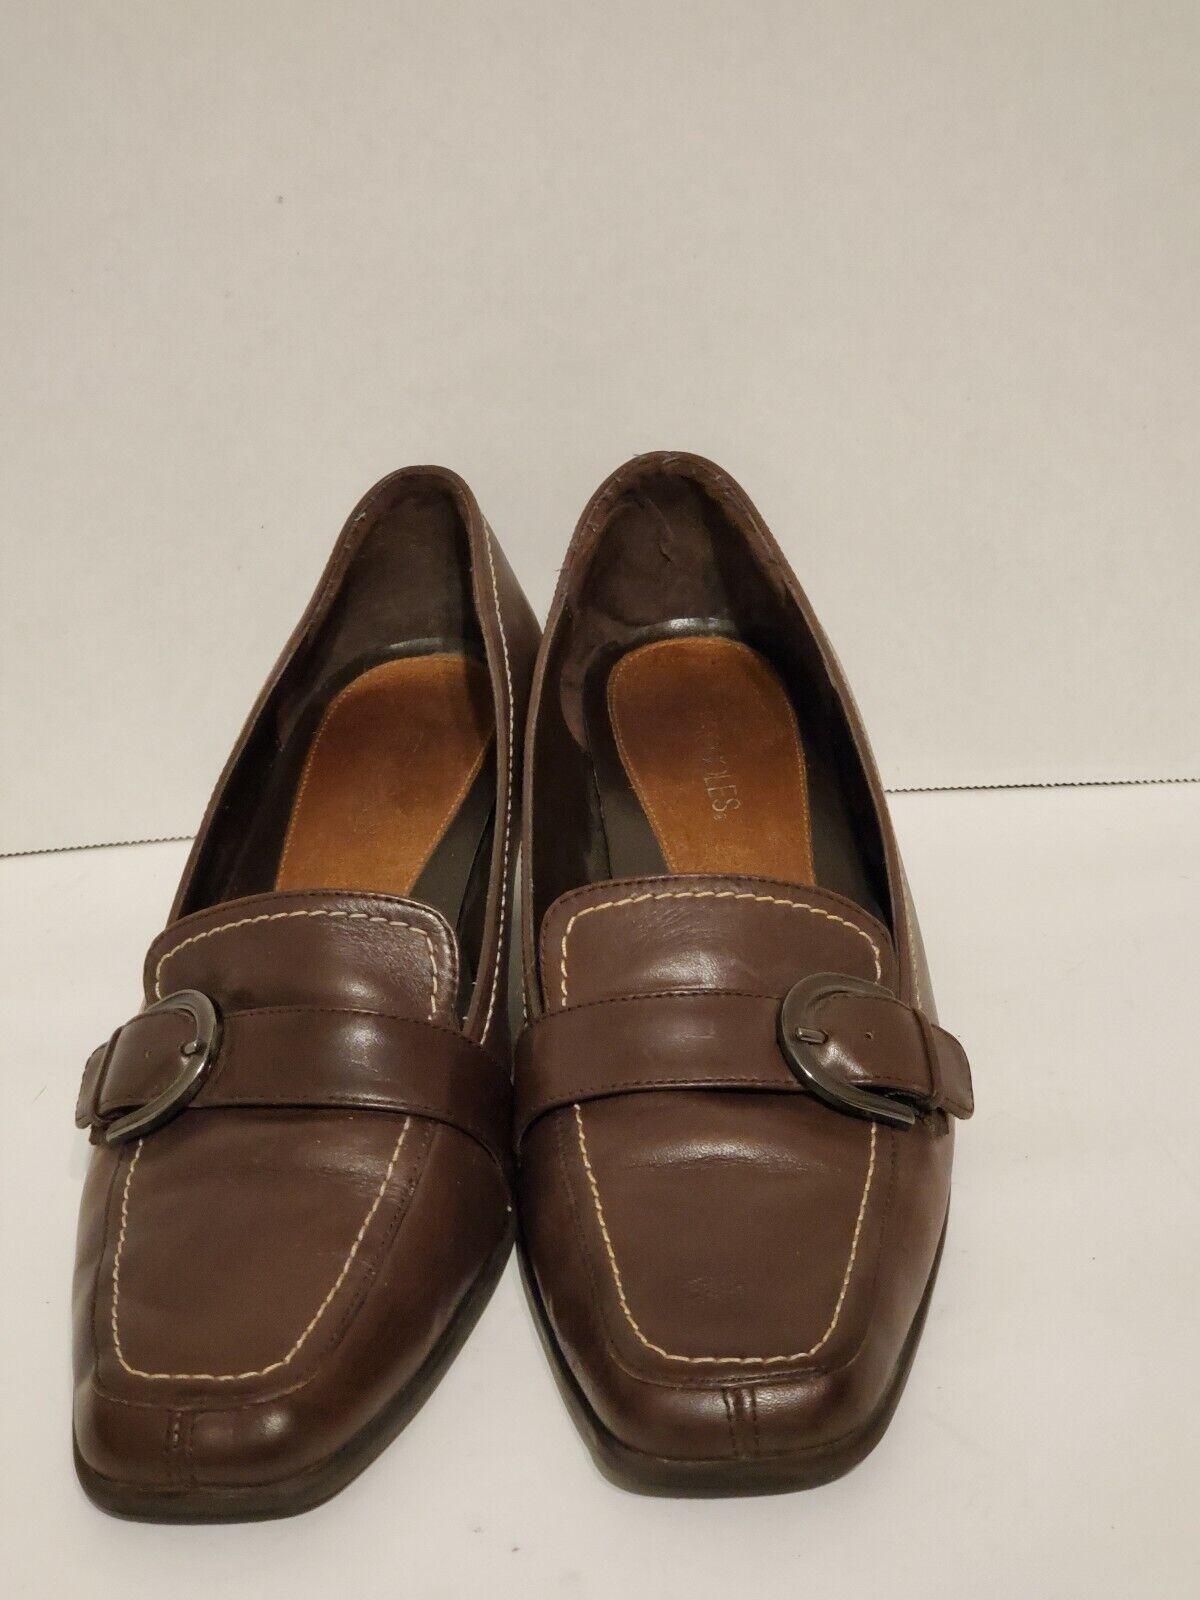 Aerosoles women's size9.5 dress shoes with 2 inch heels.